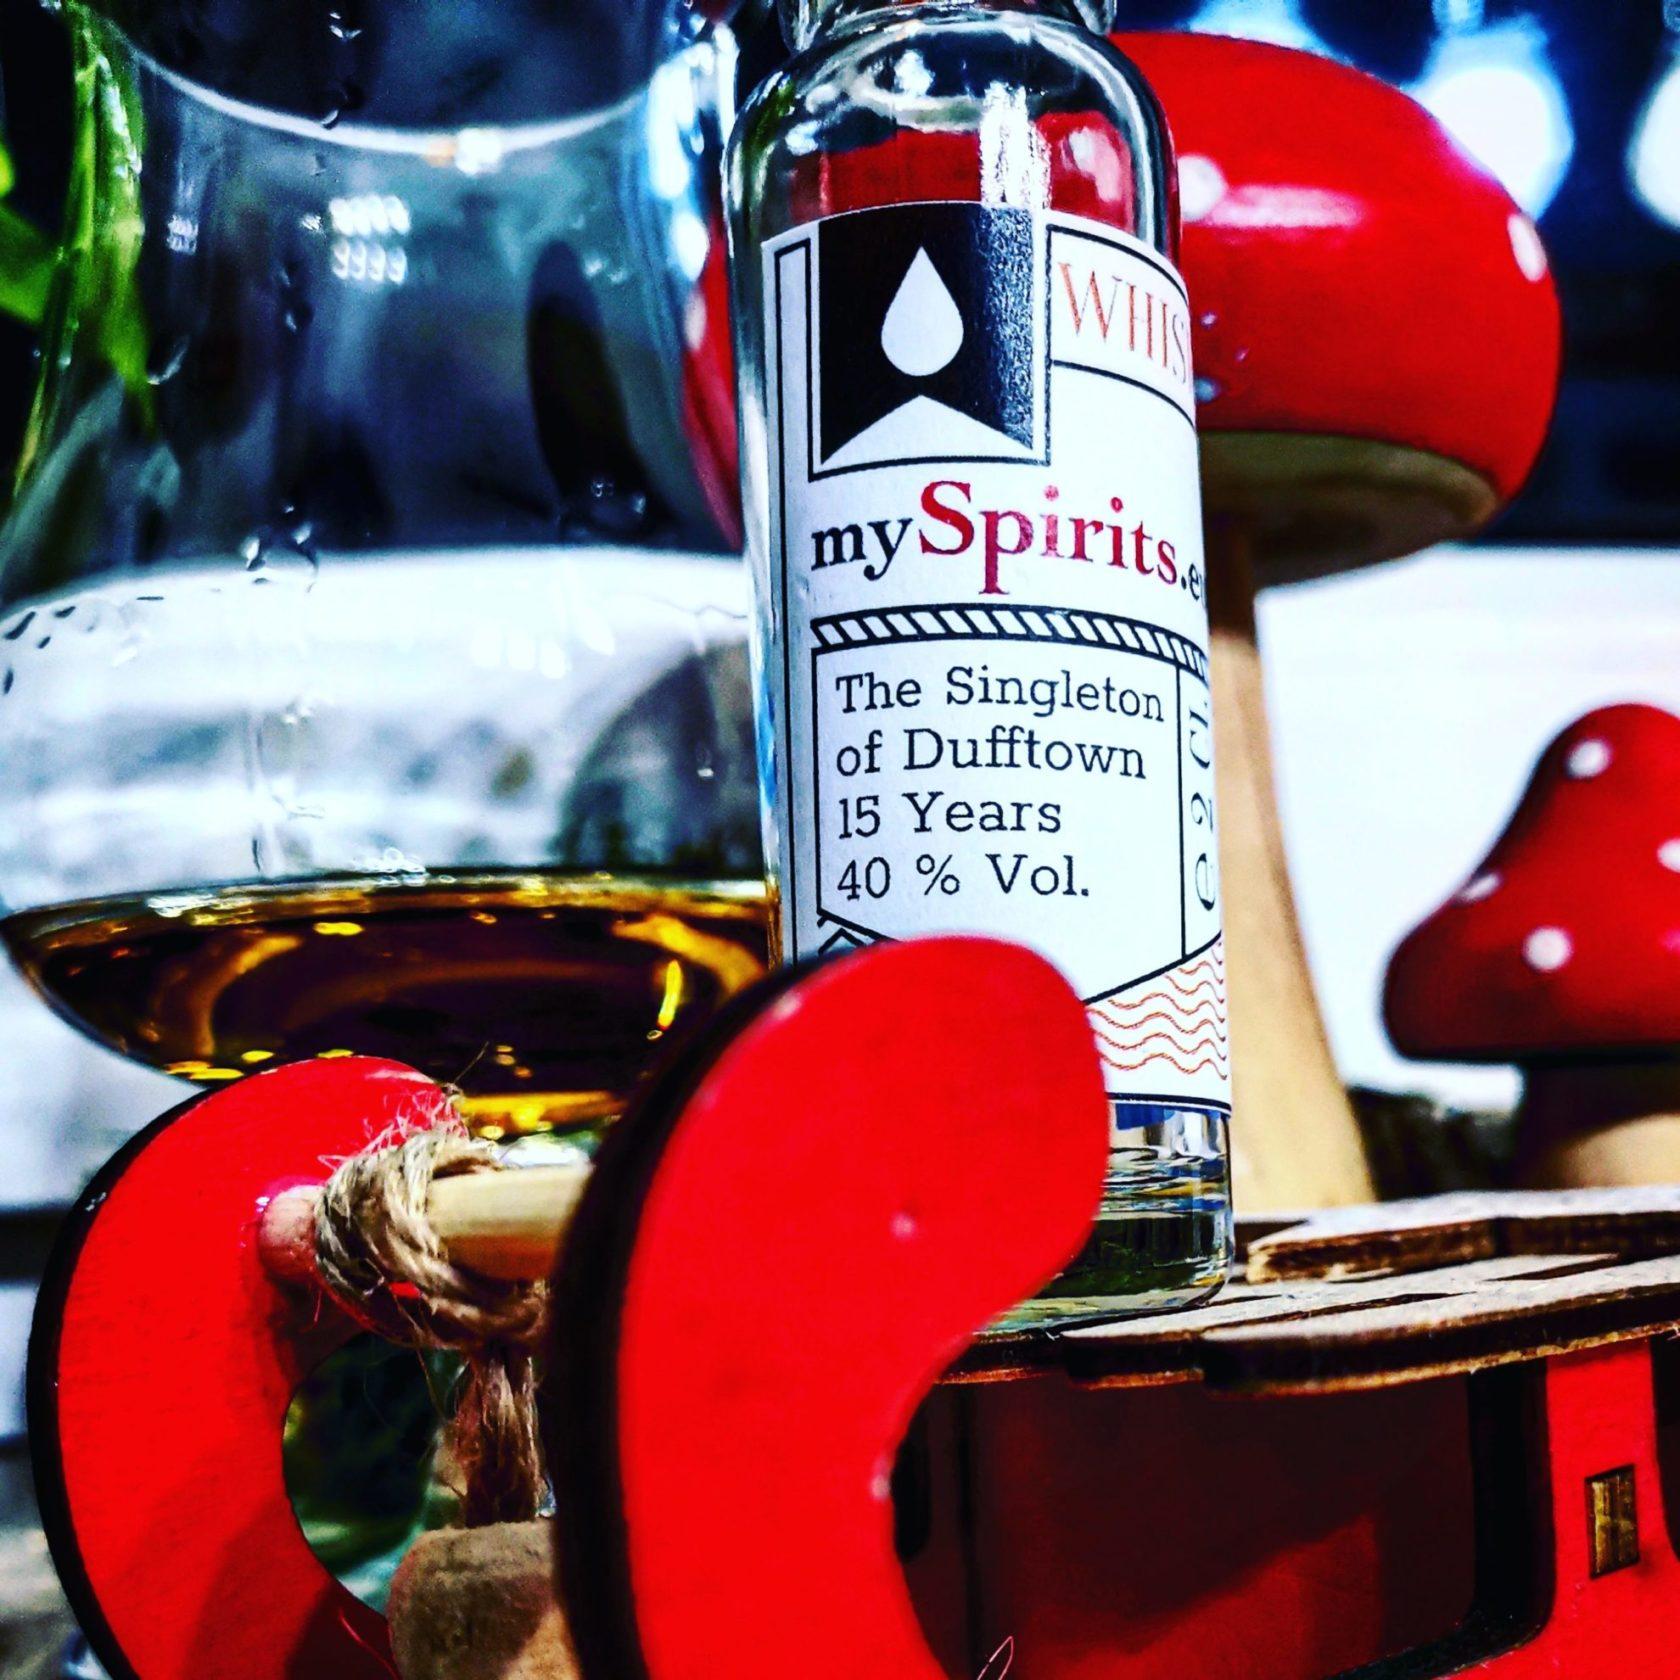 The Singleton of Dufftown 15 Jahre Speyside Single Malt Scotch Whisky